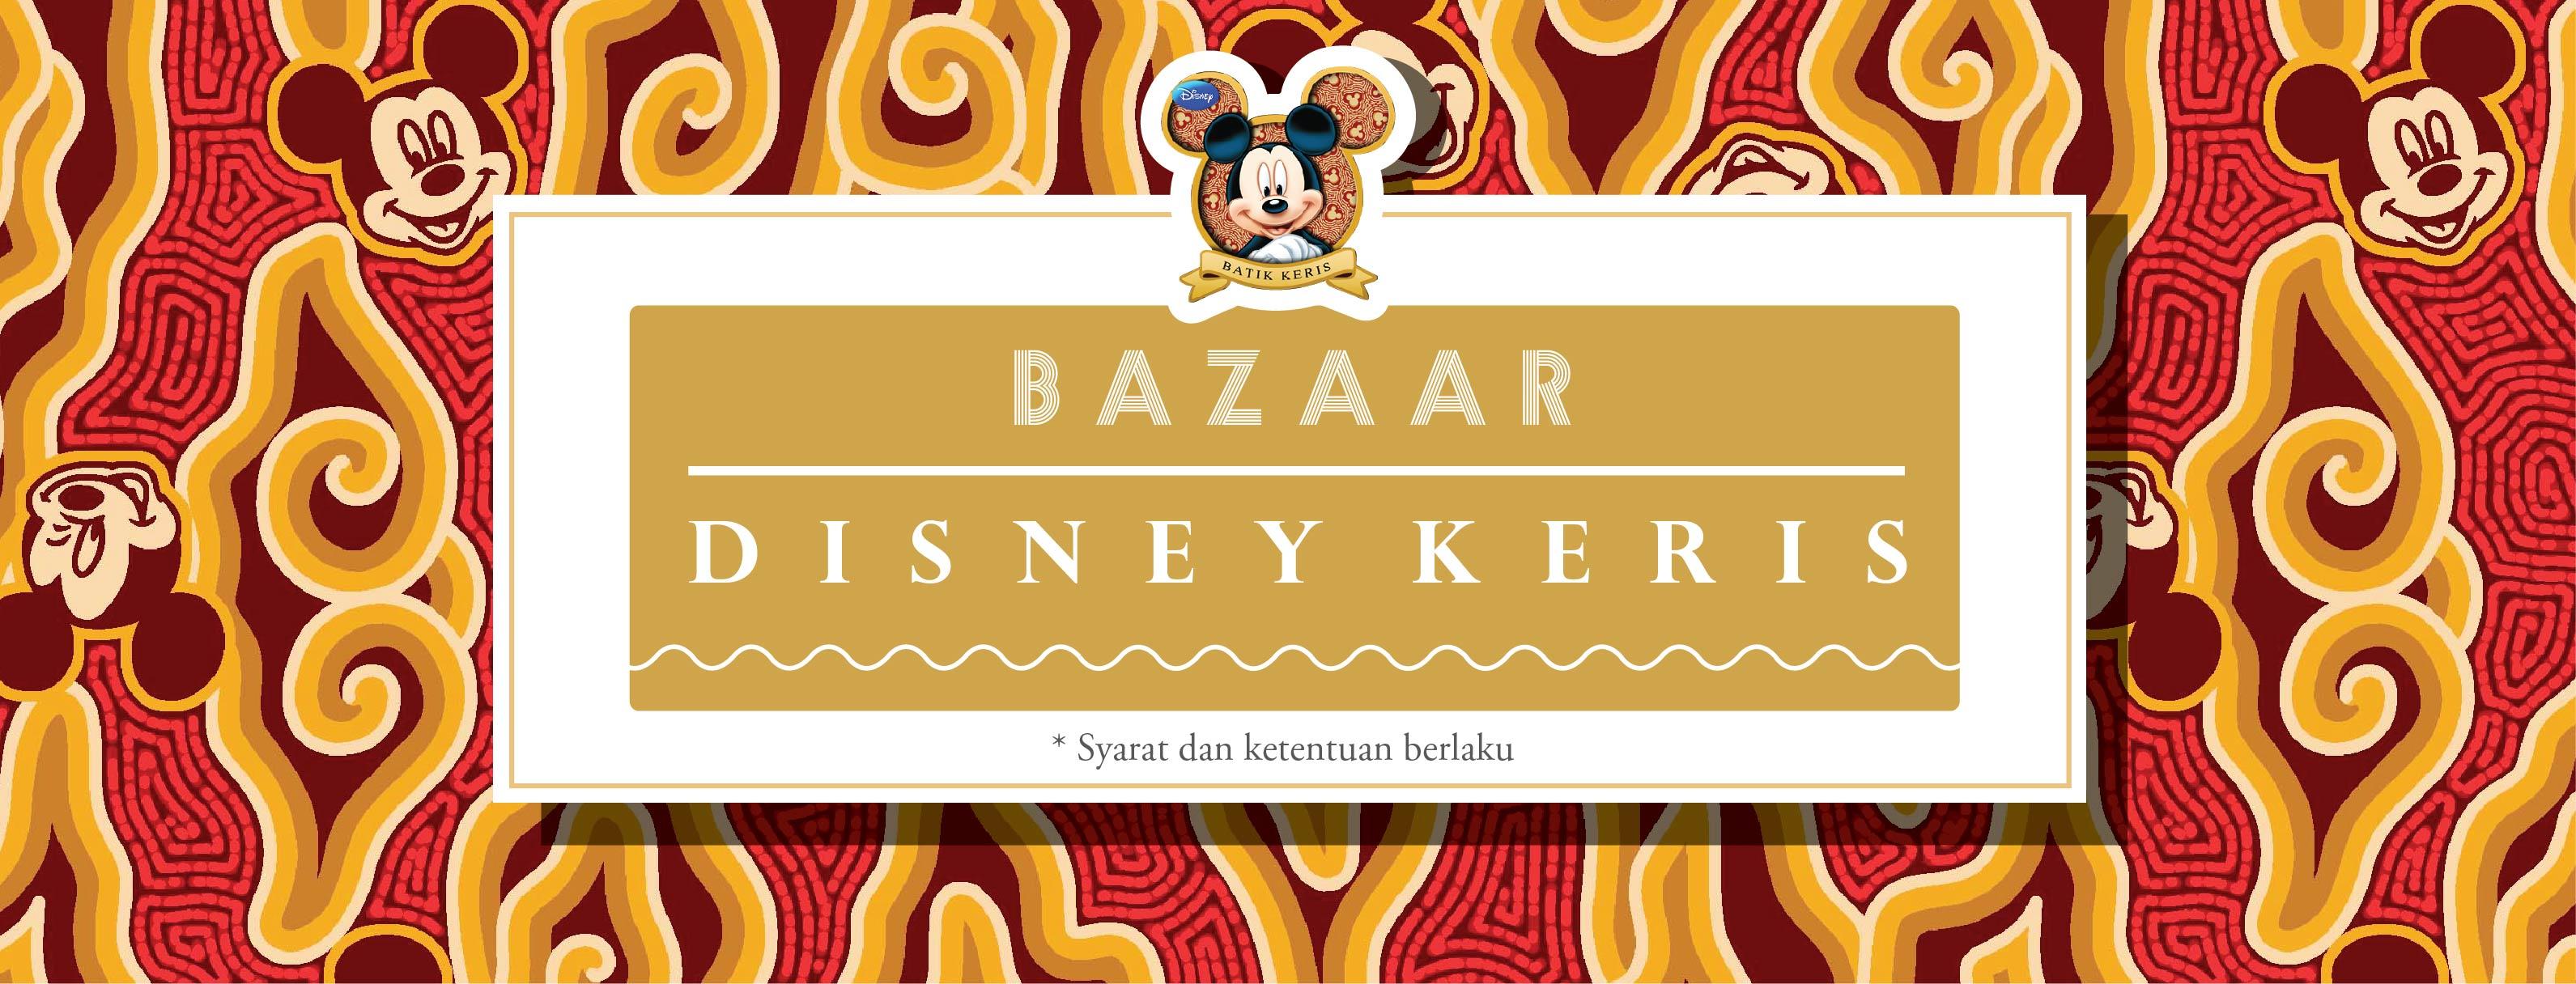 Bazaar Disney Keris